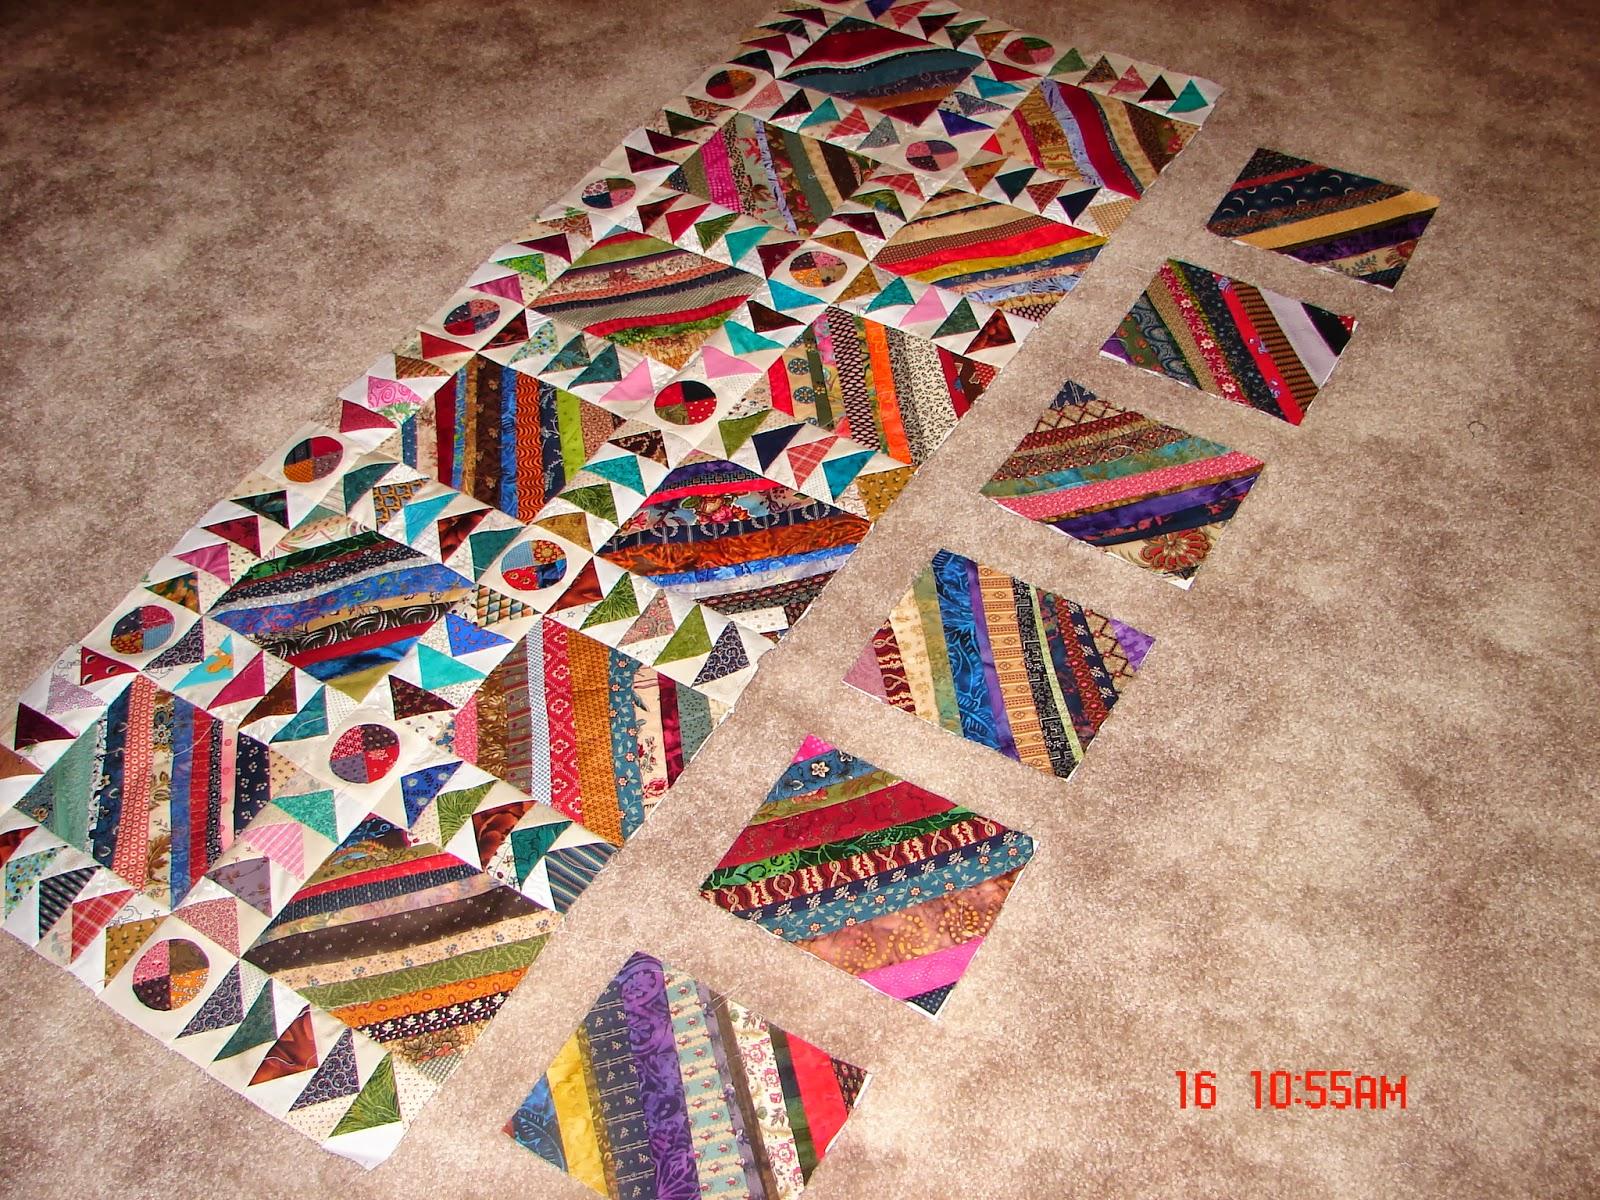 Juliekquilts strings and scraps for Scrap quilt